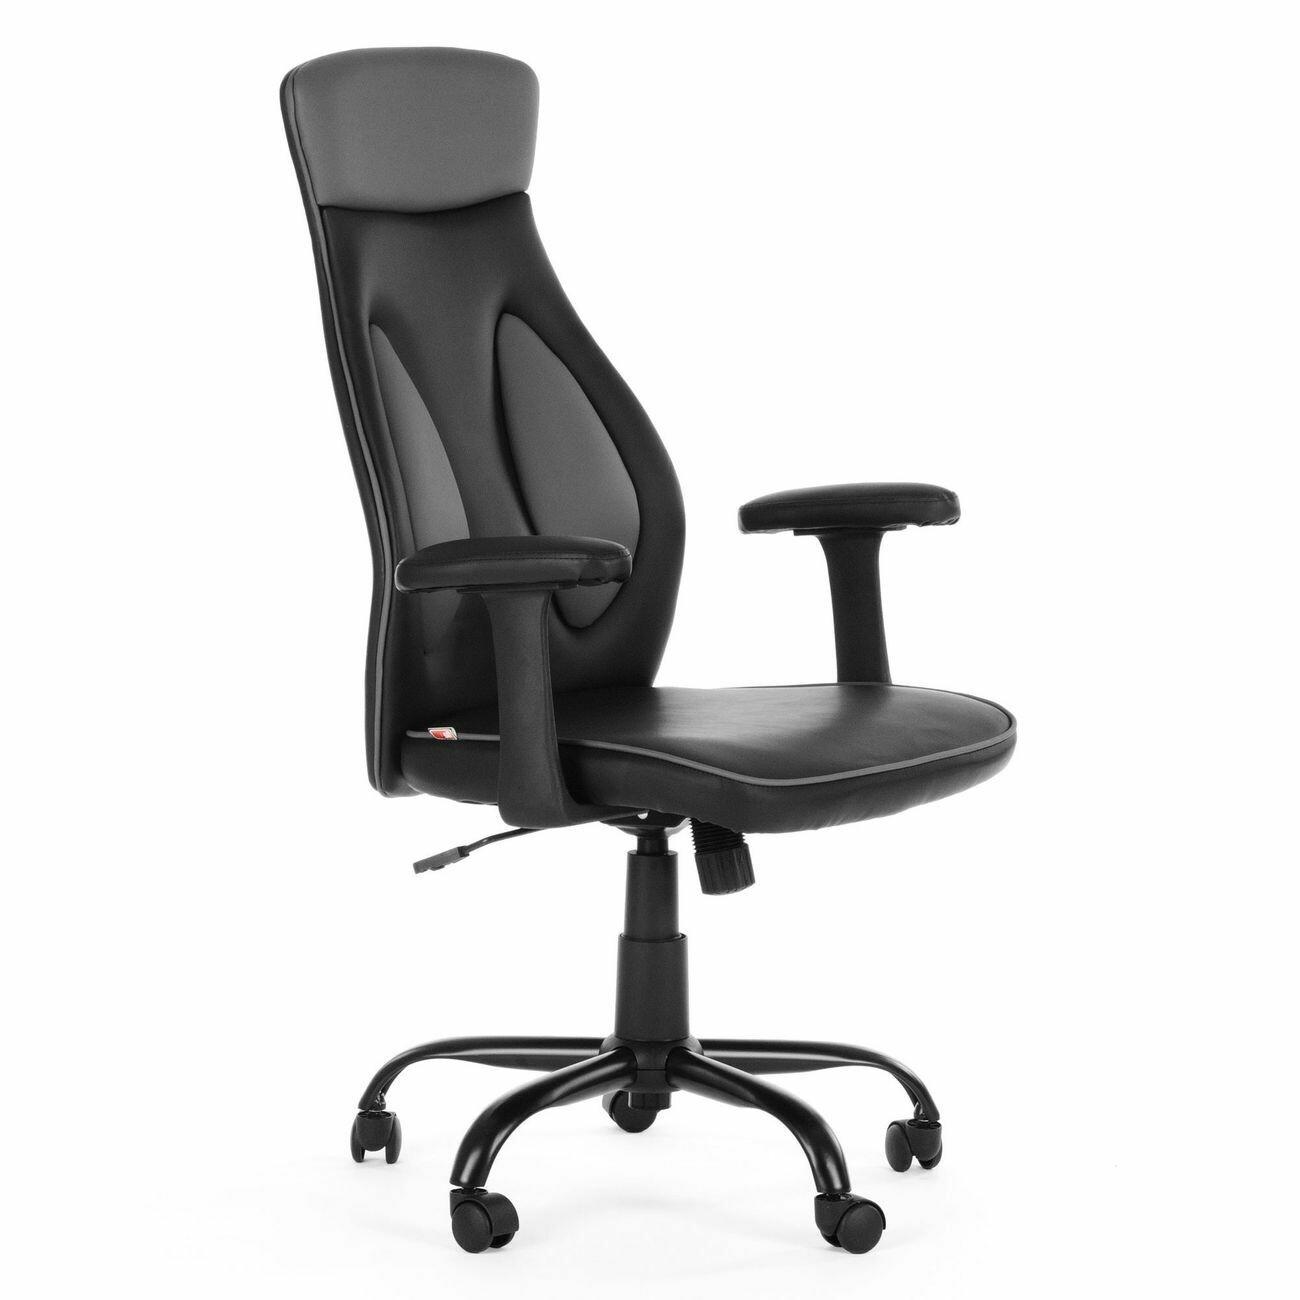 MY SIT Bürostuhl Chefsessel Samoa aus Kunstleder grau-schwarz